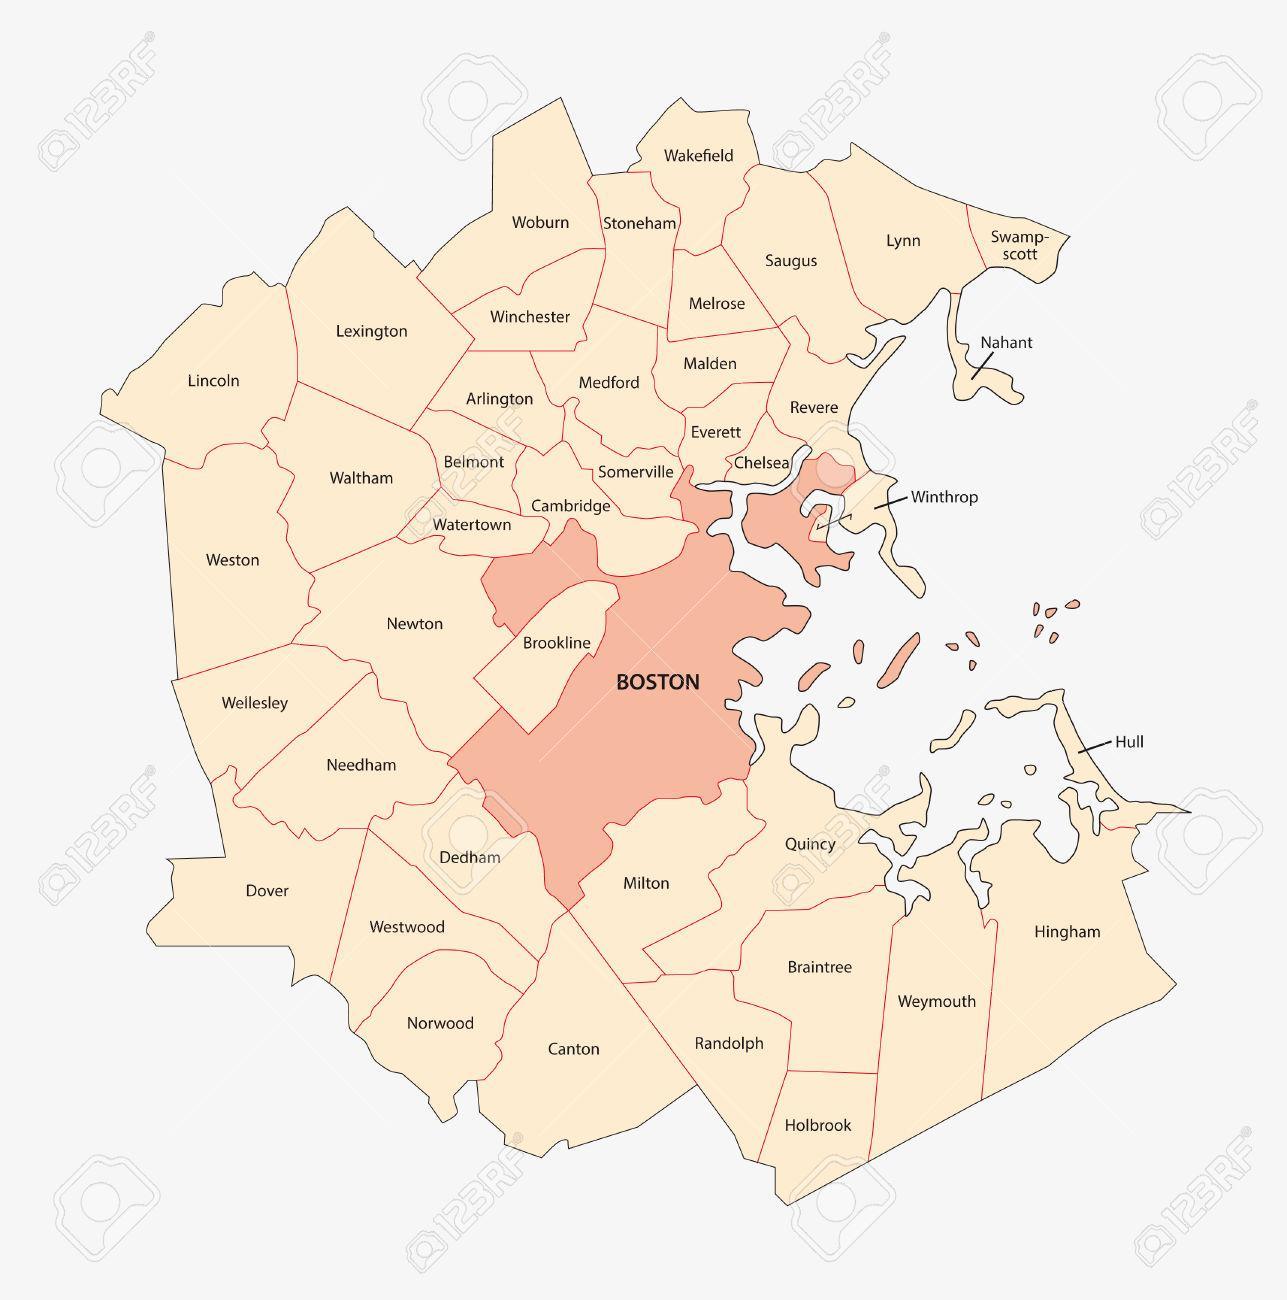 Map of Boston area Map Boston area United States of America